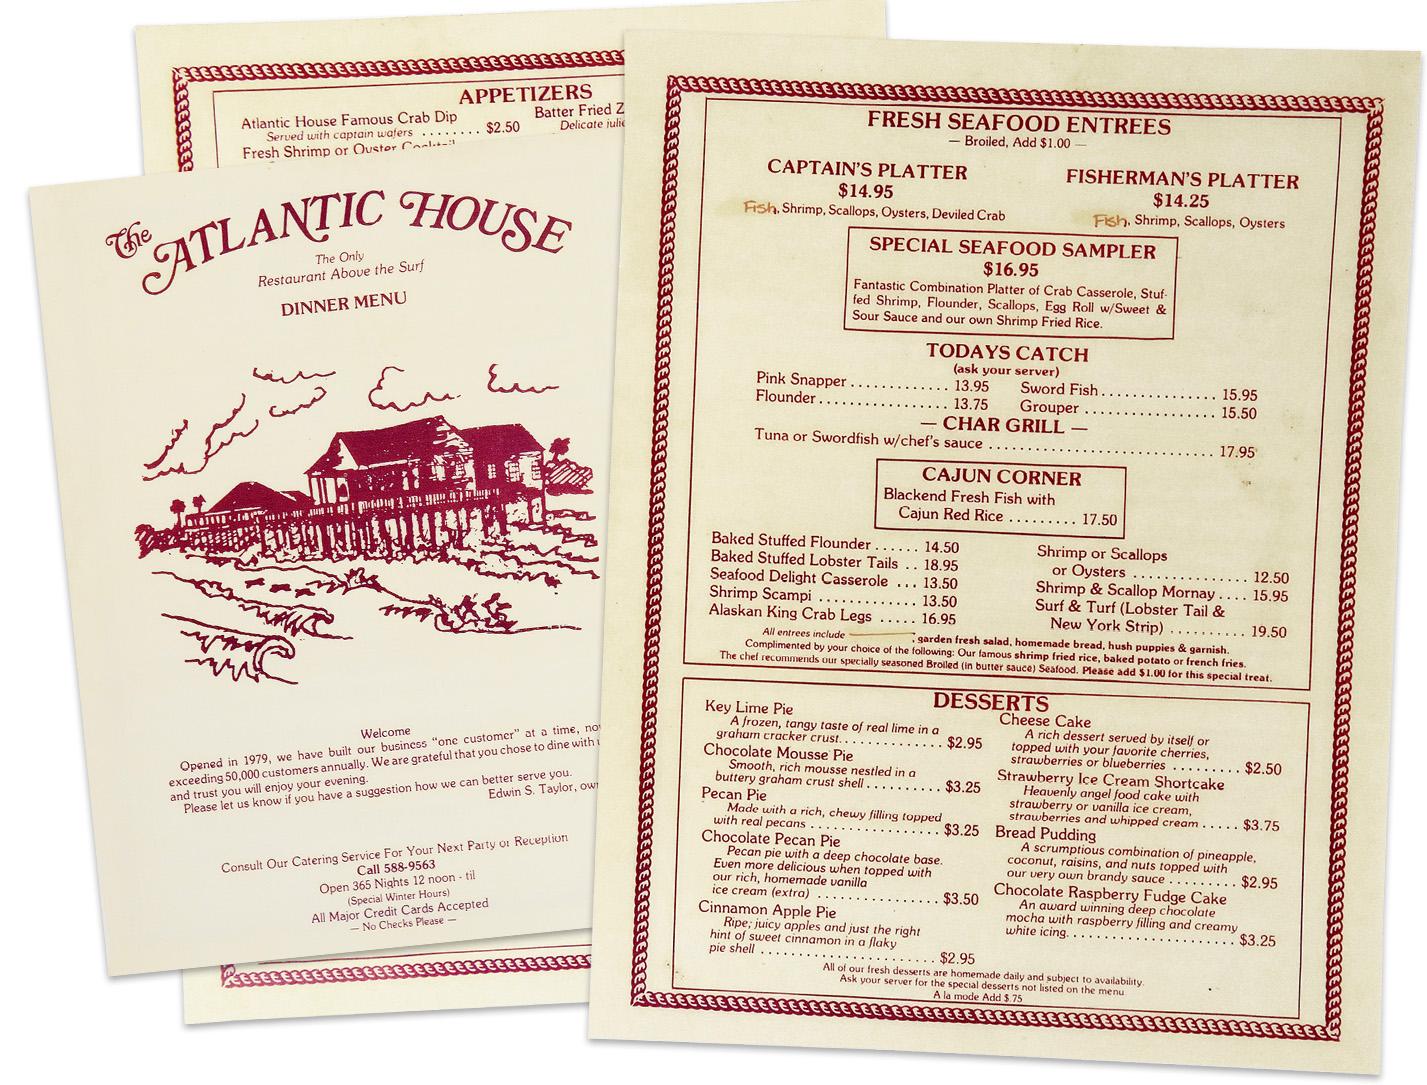 The Atlantic House menu